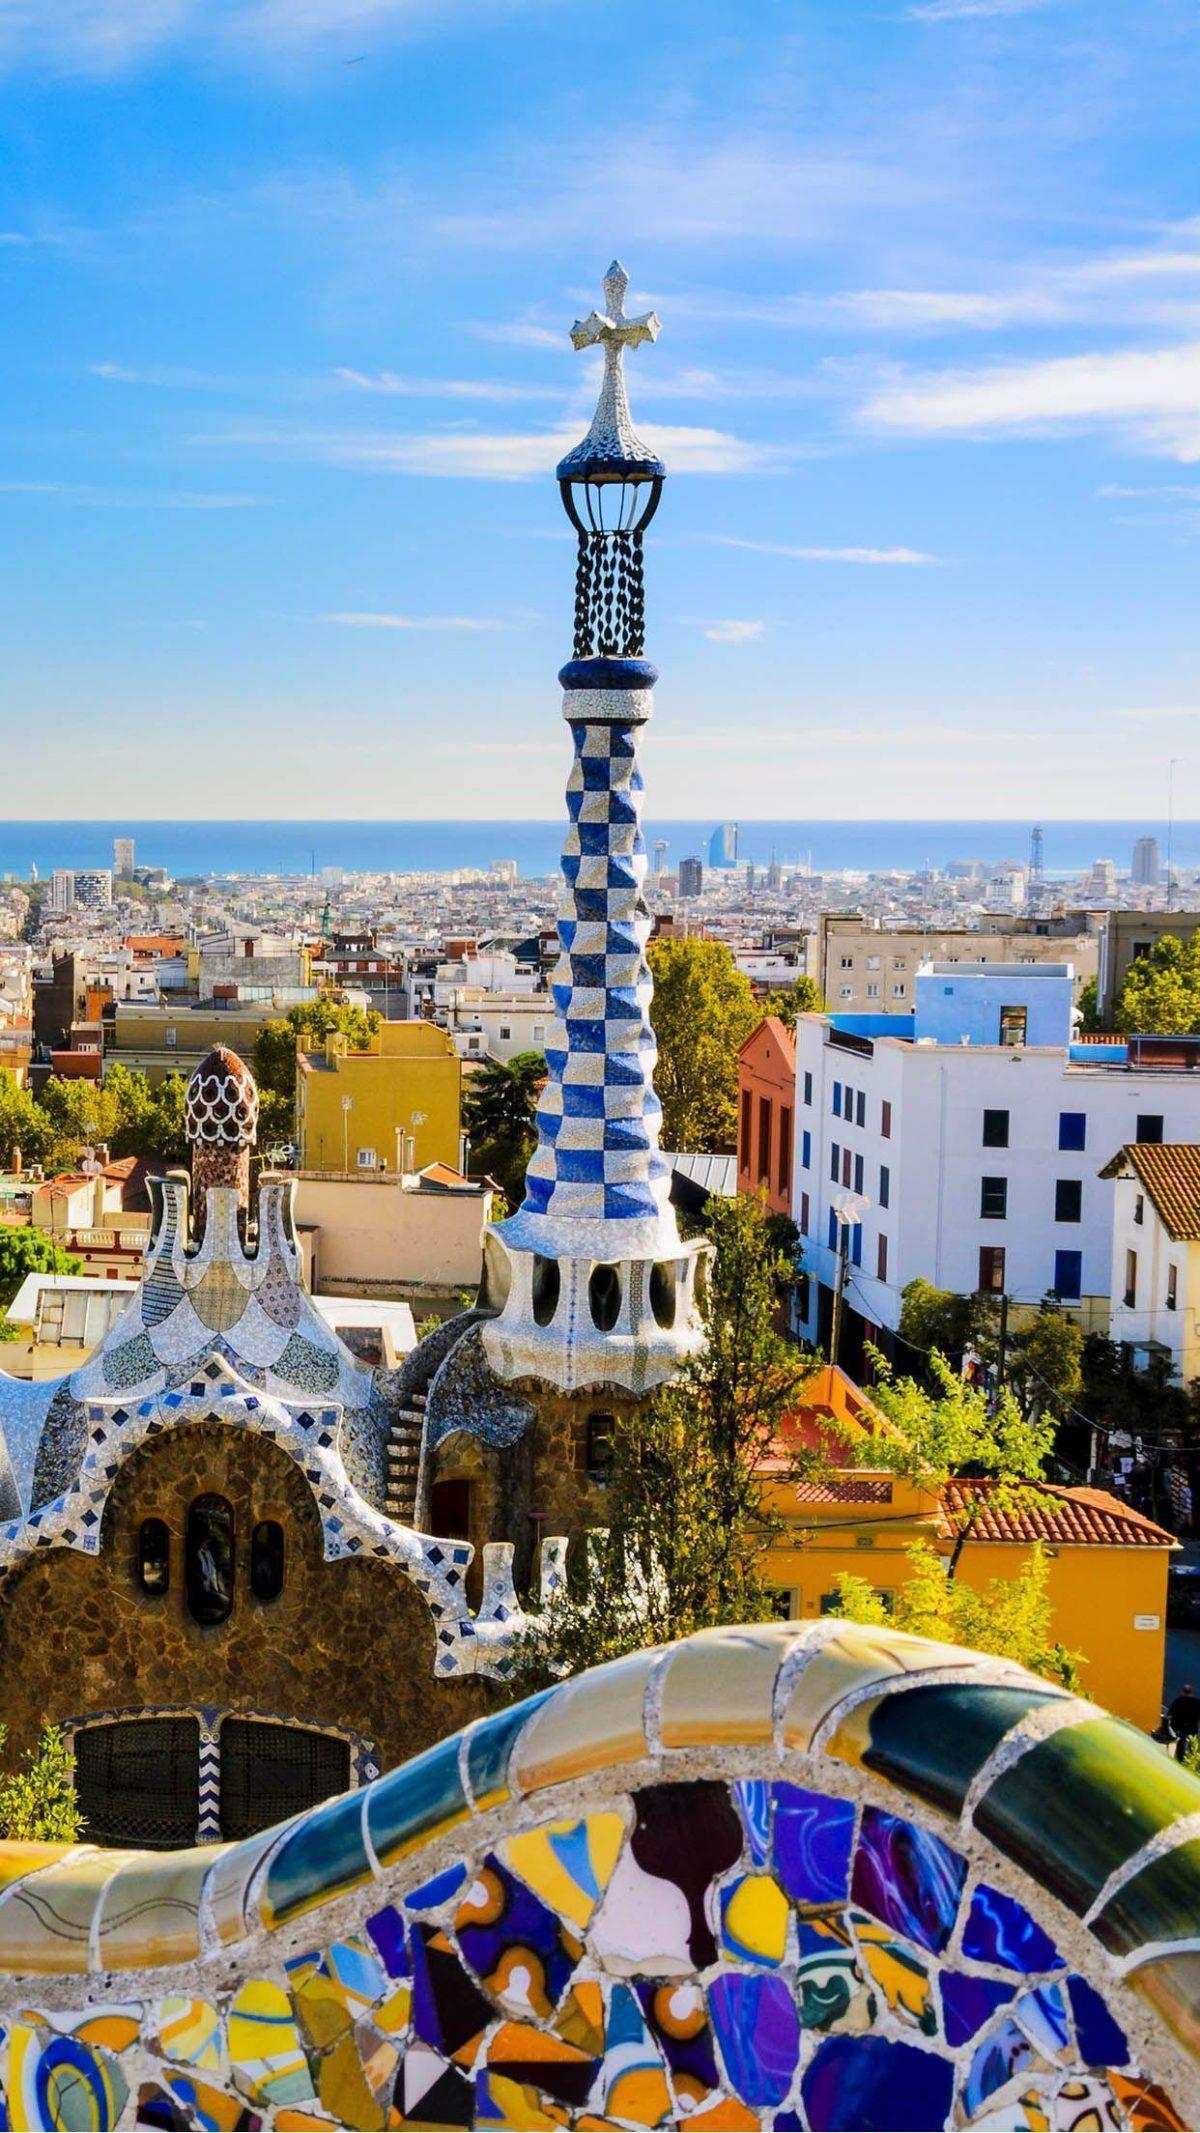 Barcelona beautiful city iphone 6plus hd wallpapers free | iPhone …